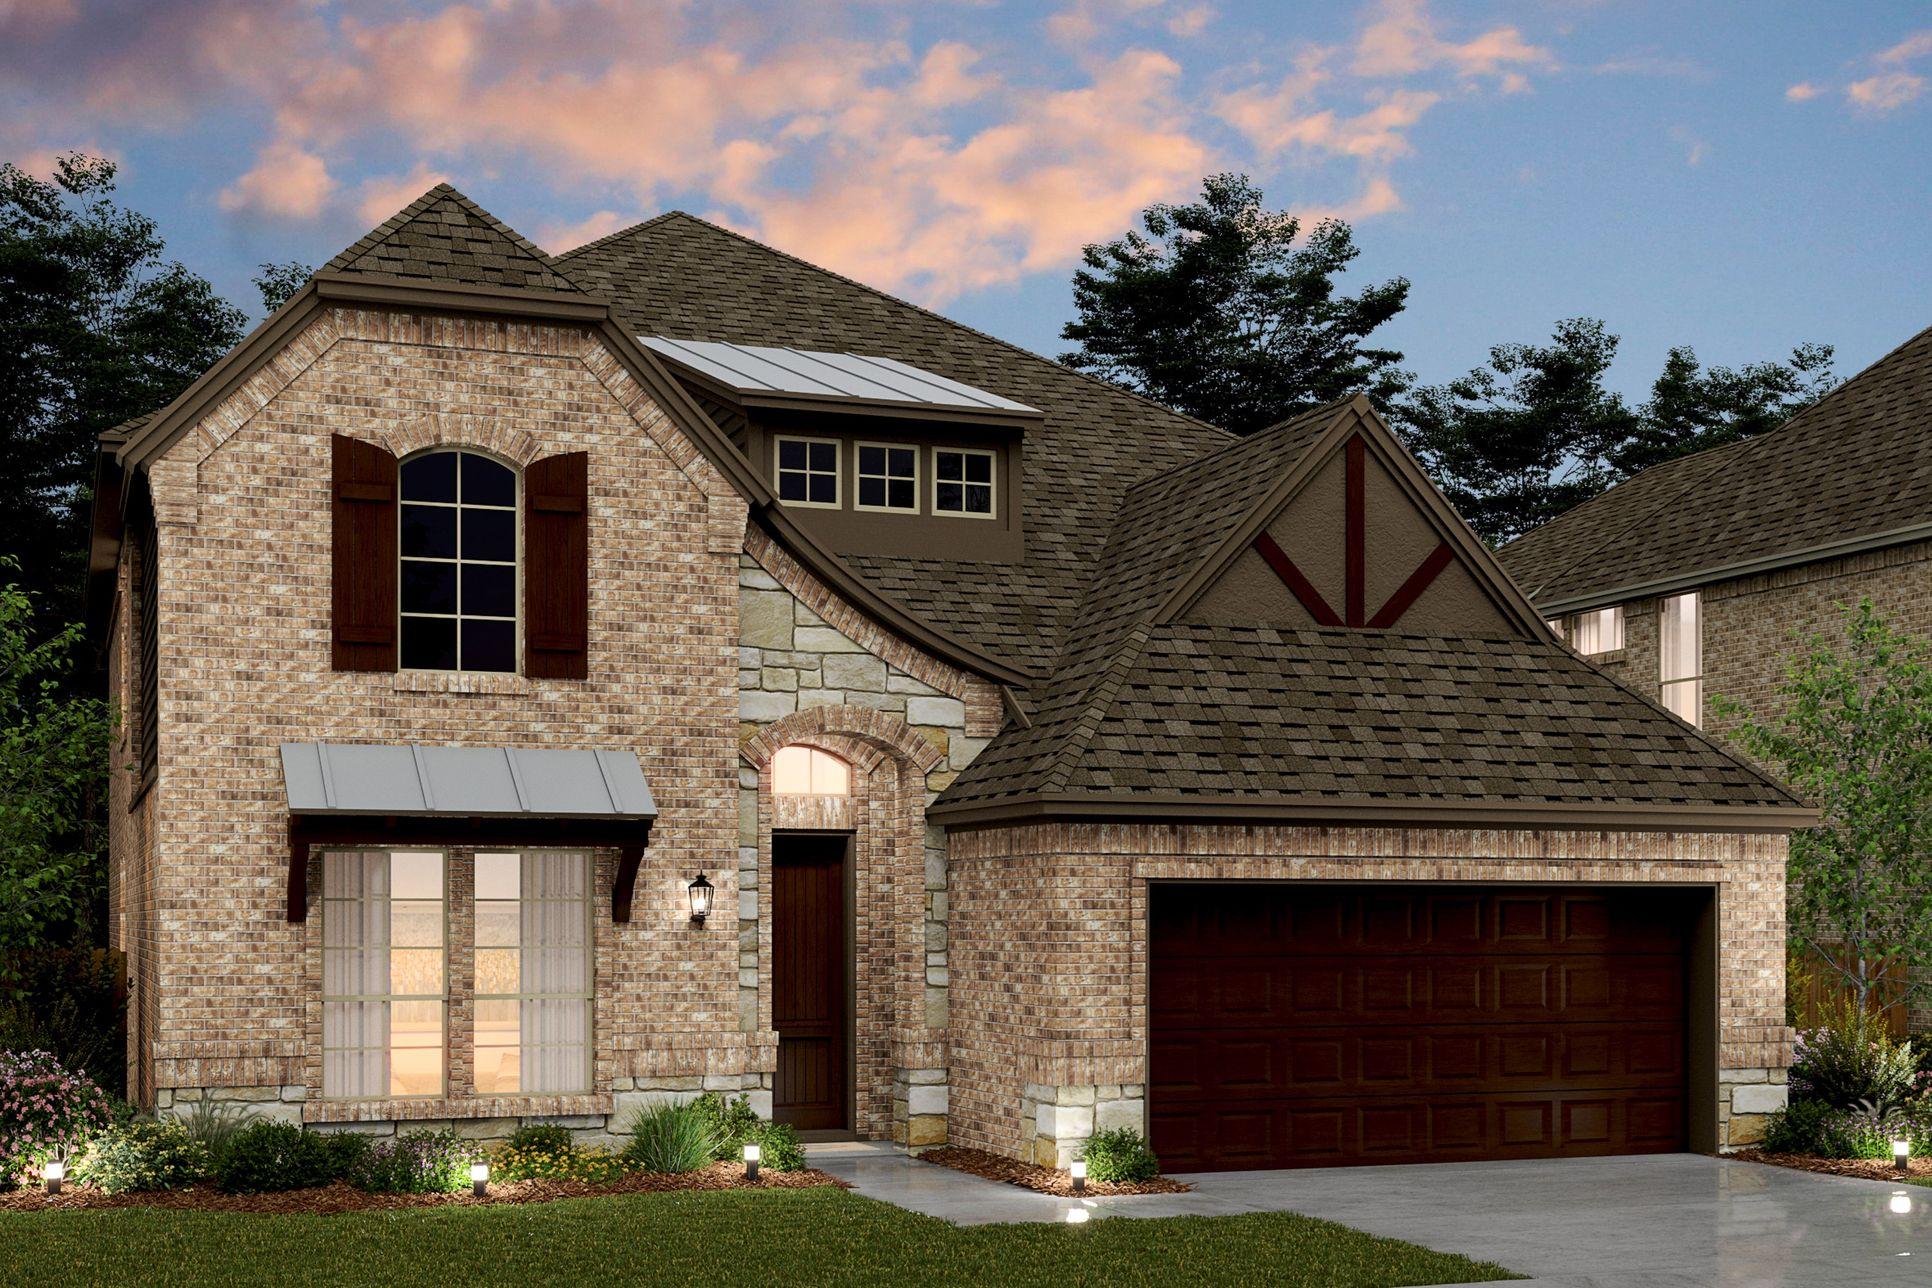 Exterior:Coronado VIII - D - Opt stone & metal roof